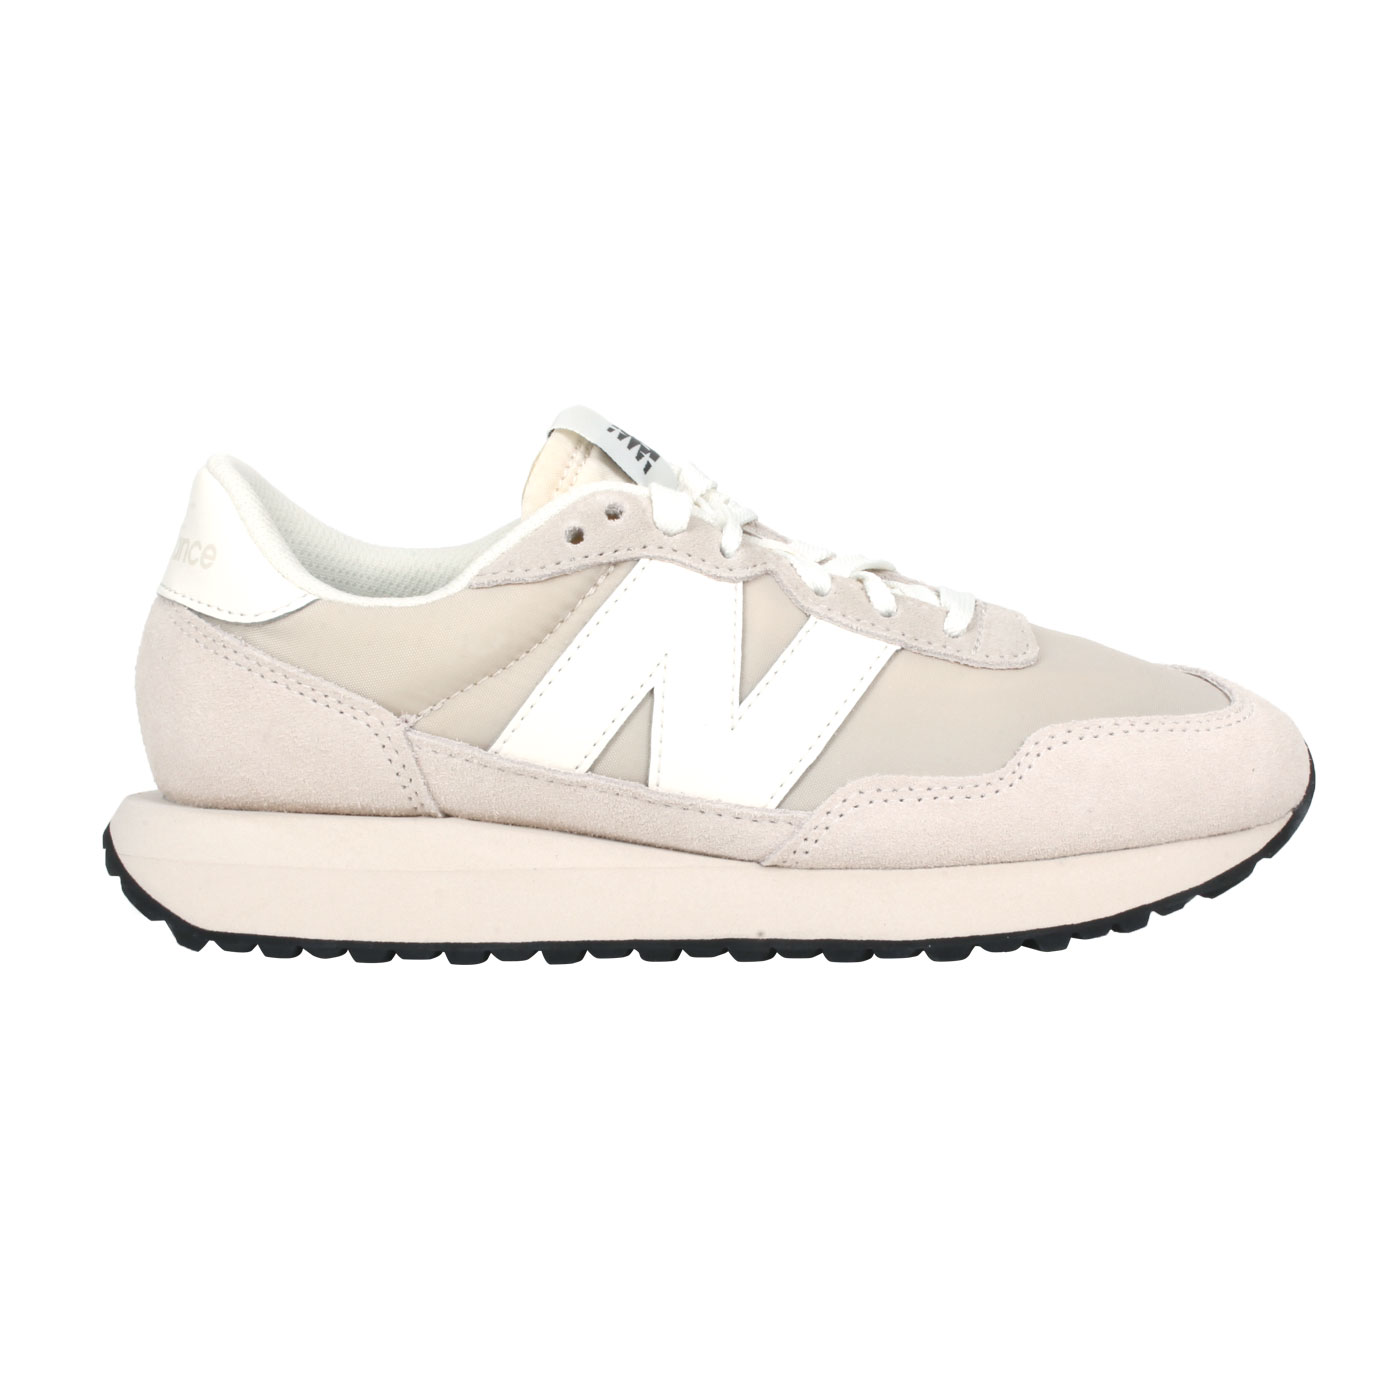 NEW BALANCE 女款休閒運動鞋 WS237DH1 - 米白棕